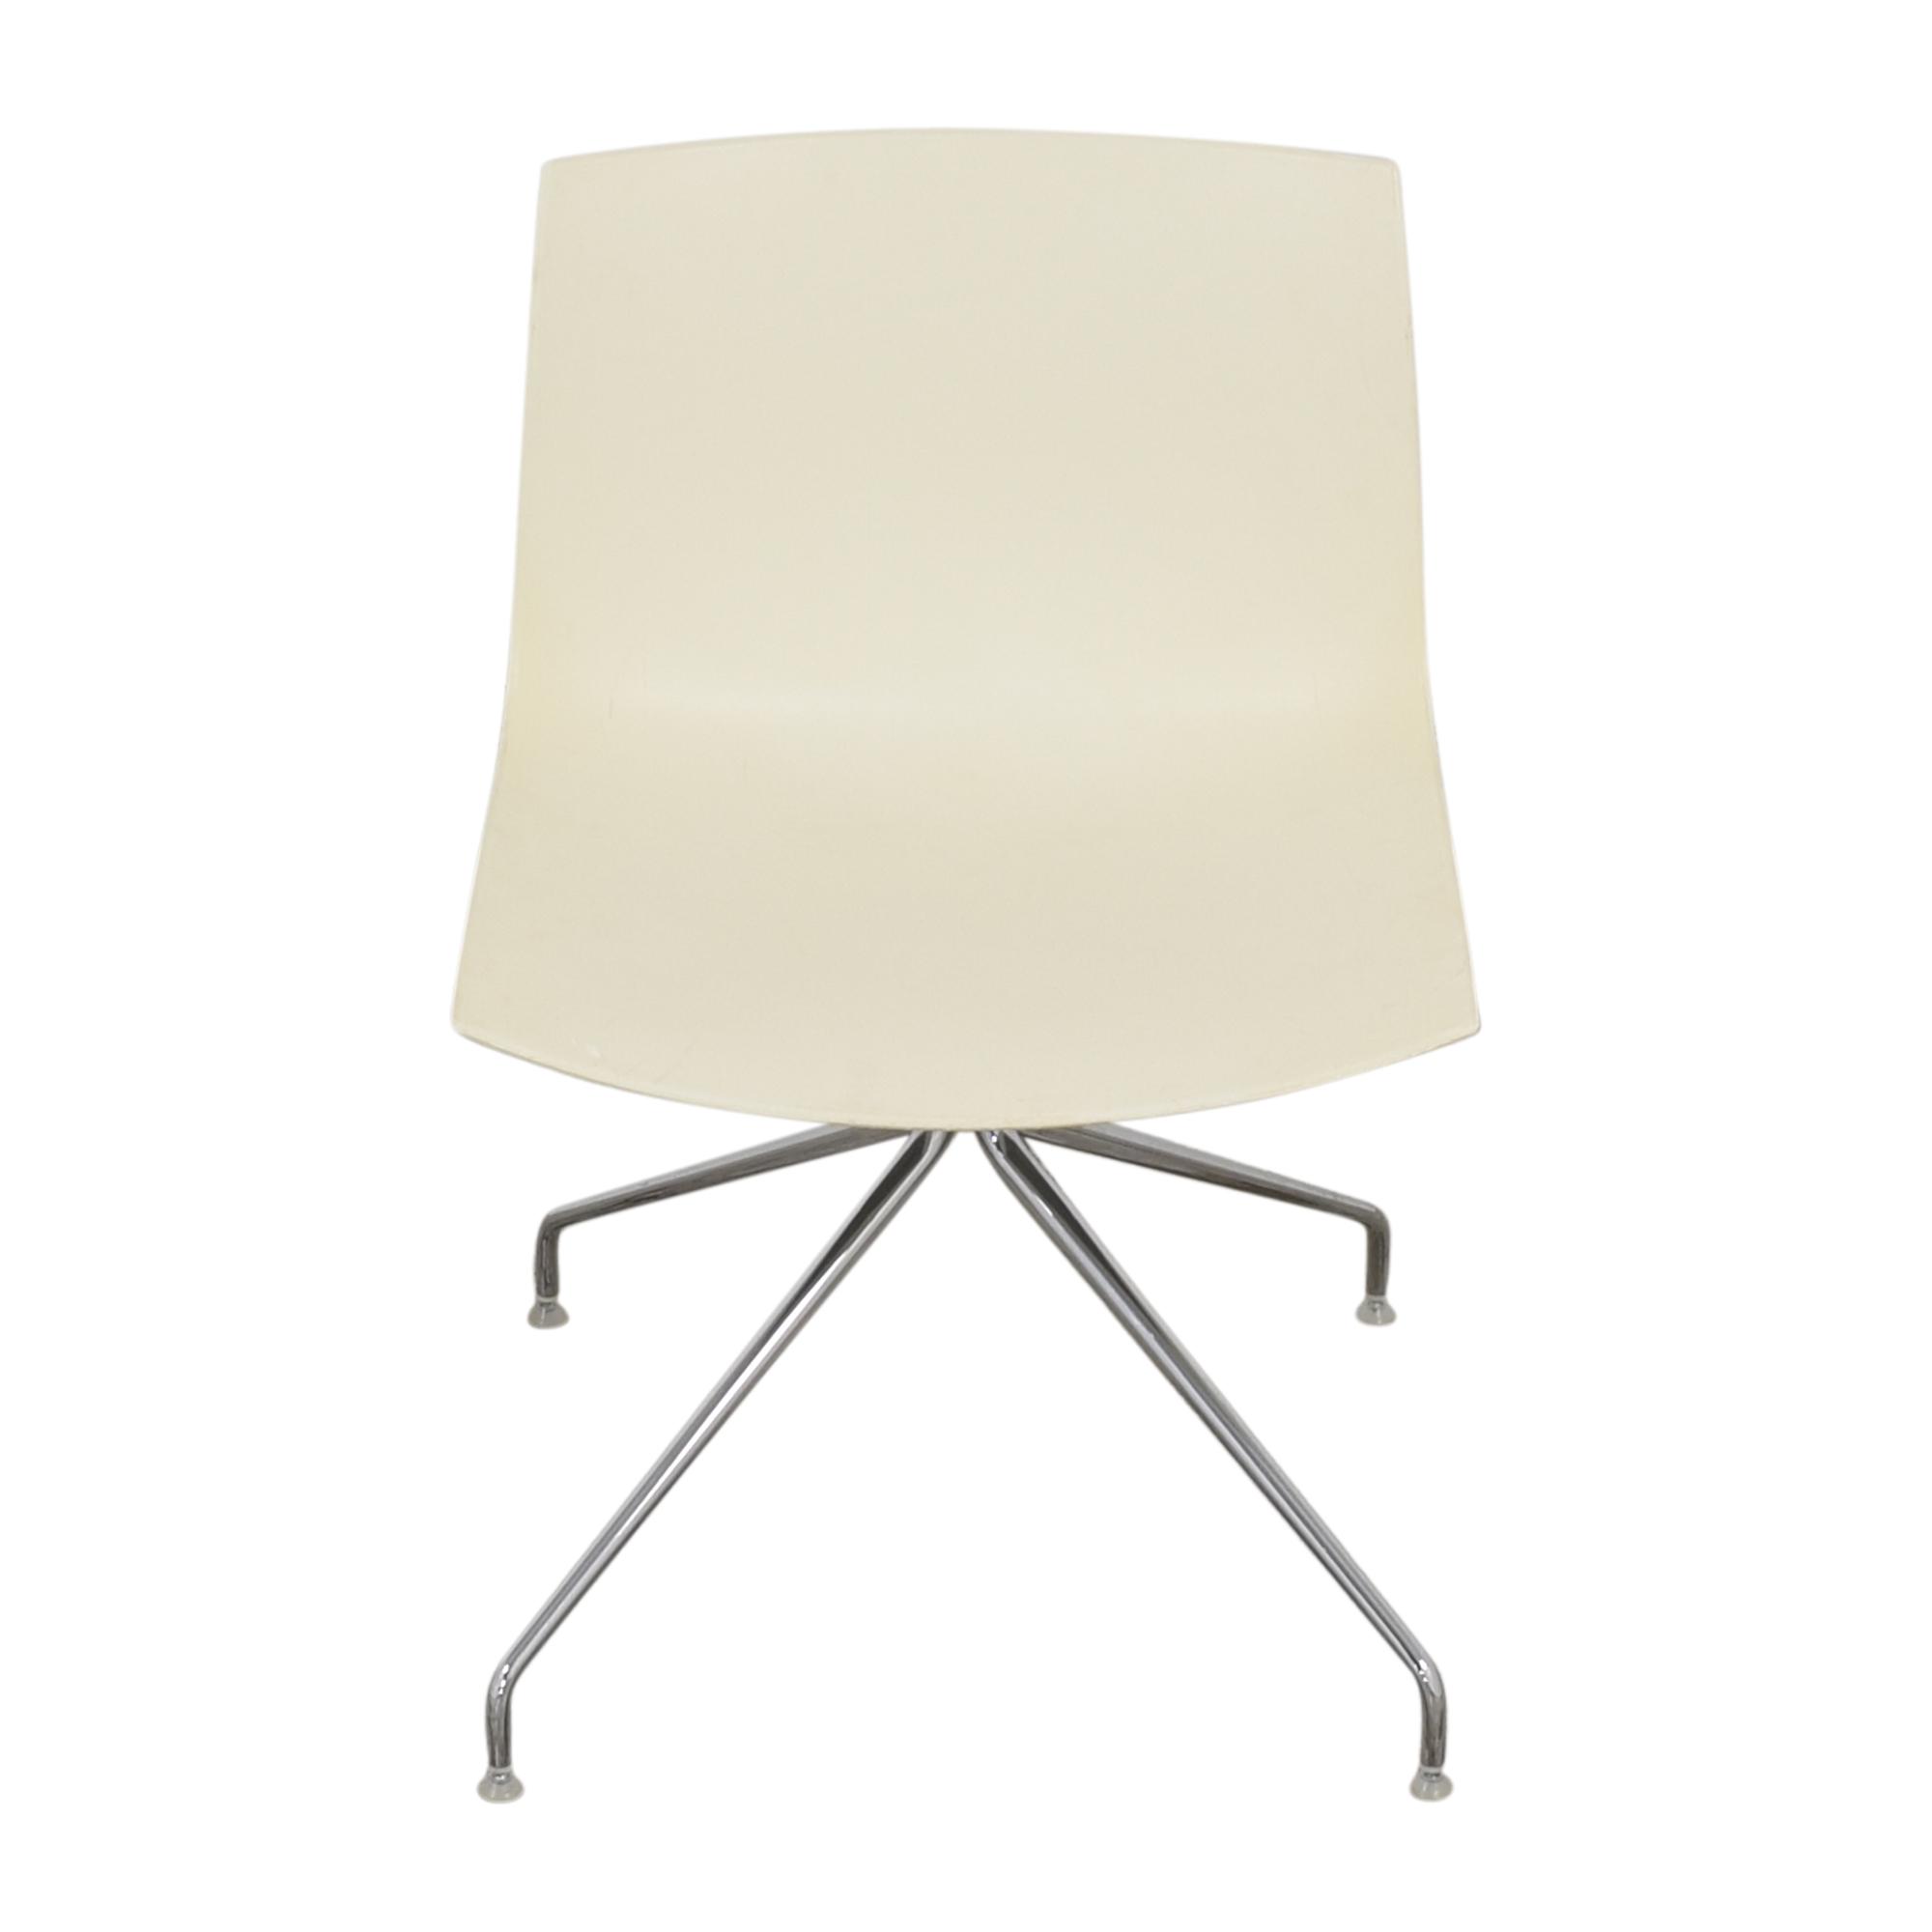 Arper Arper Catifa 46 Trestle Swivel Chair second hand